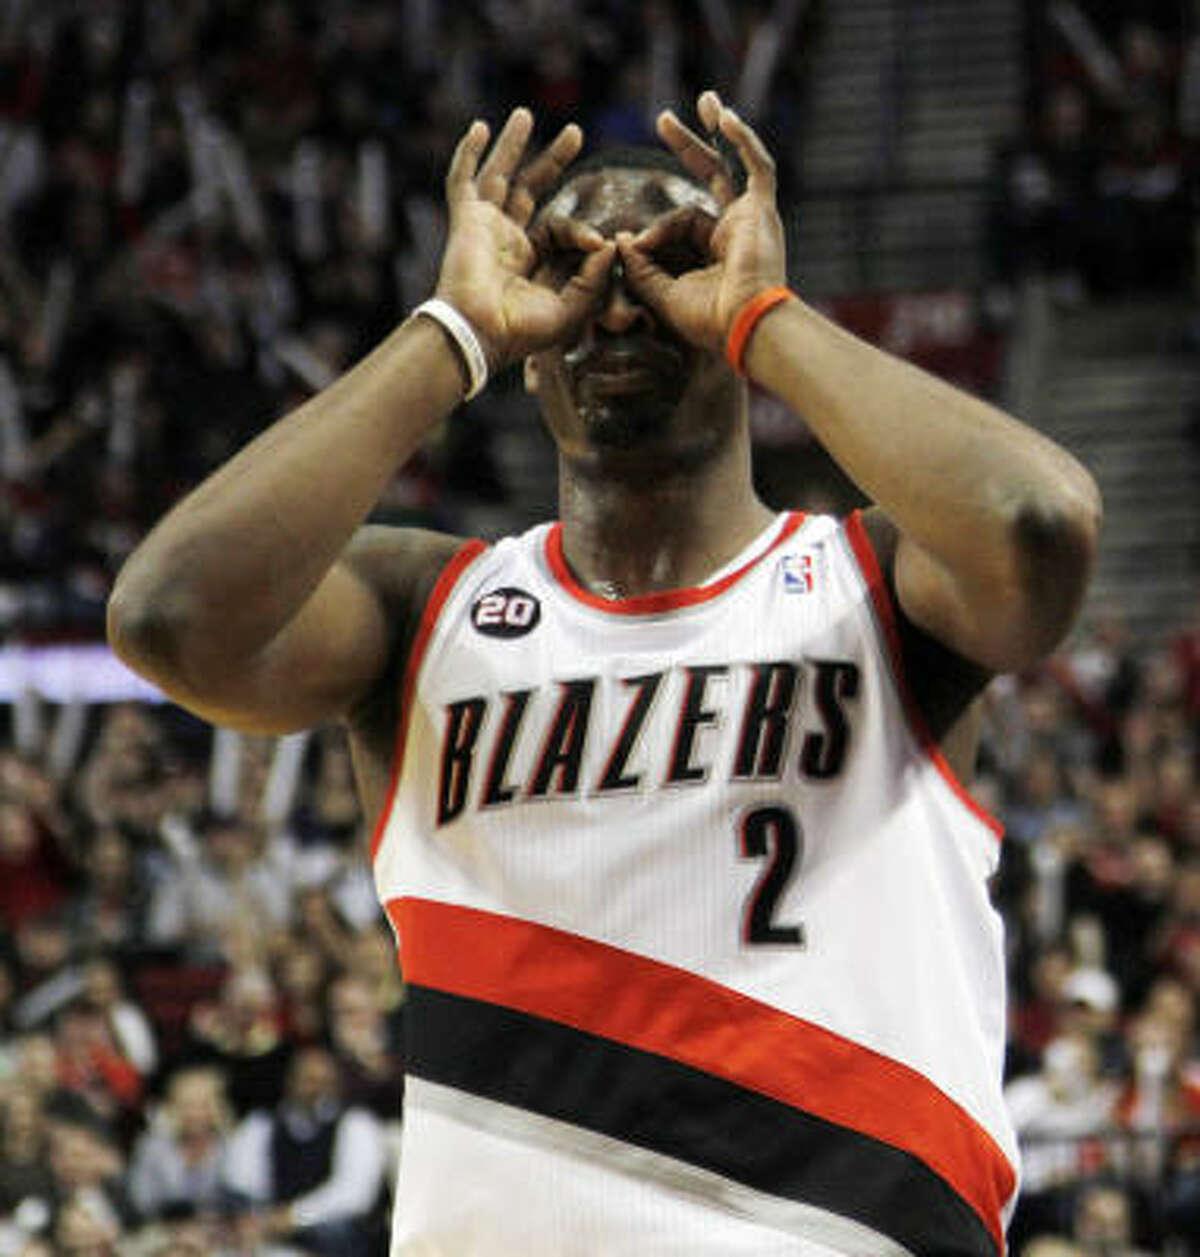 Trail Blazers guard Wesley Matthews celebrates sinking a 3-point shot.